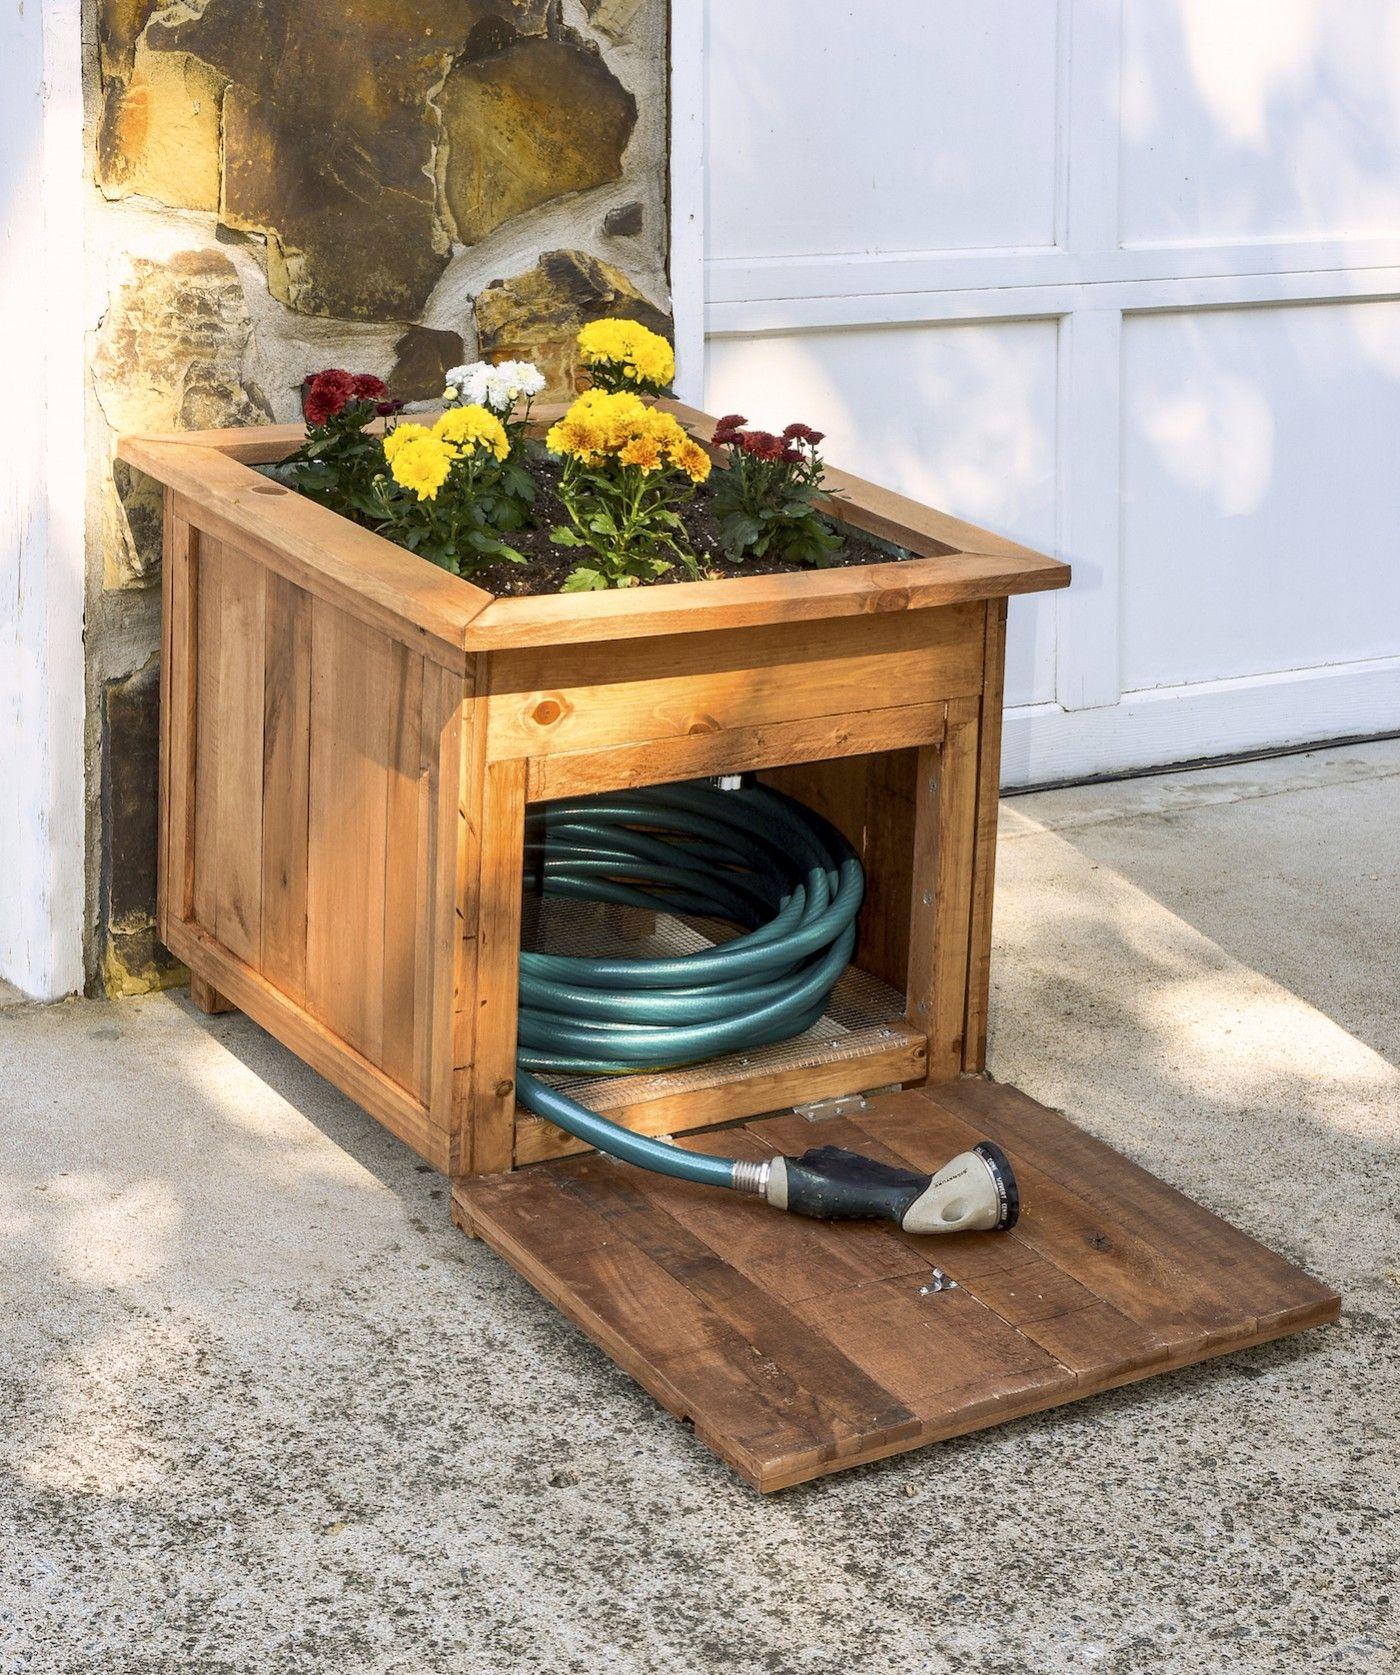 Diy Hose Holder With Pallet Wood Planter Diy Outdoor 400 x 300